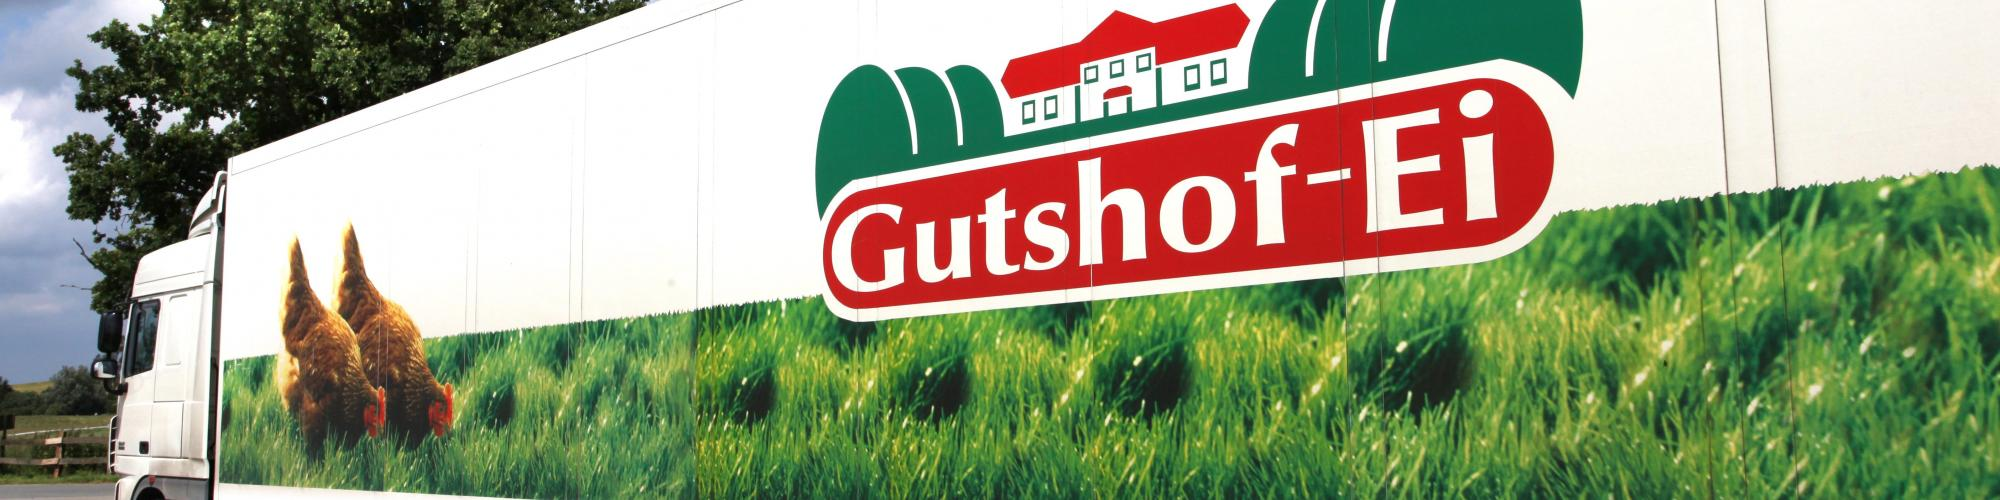 Gutshof-Ei GmbH